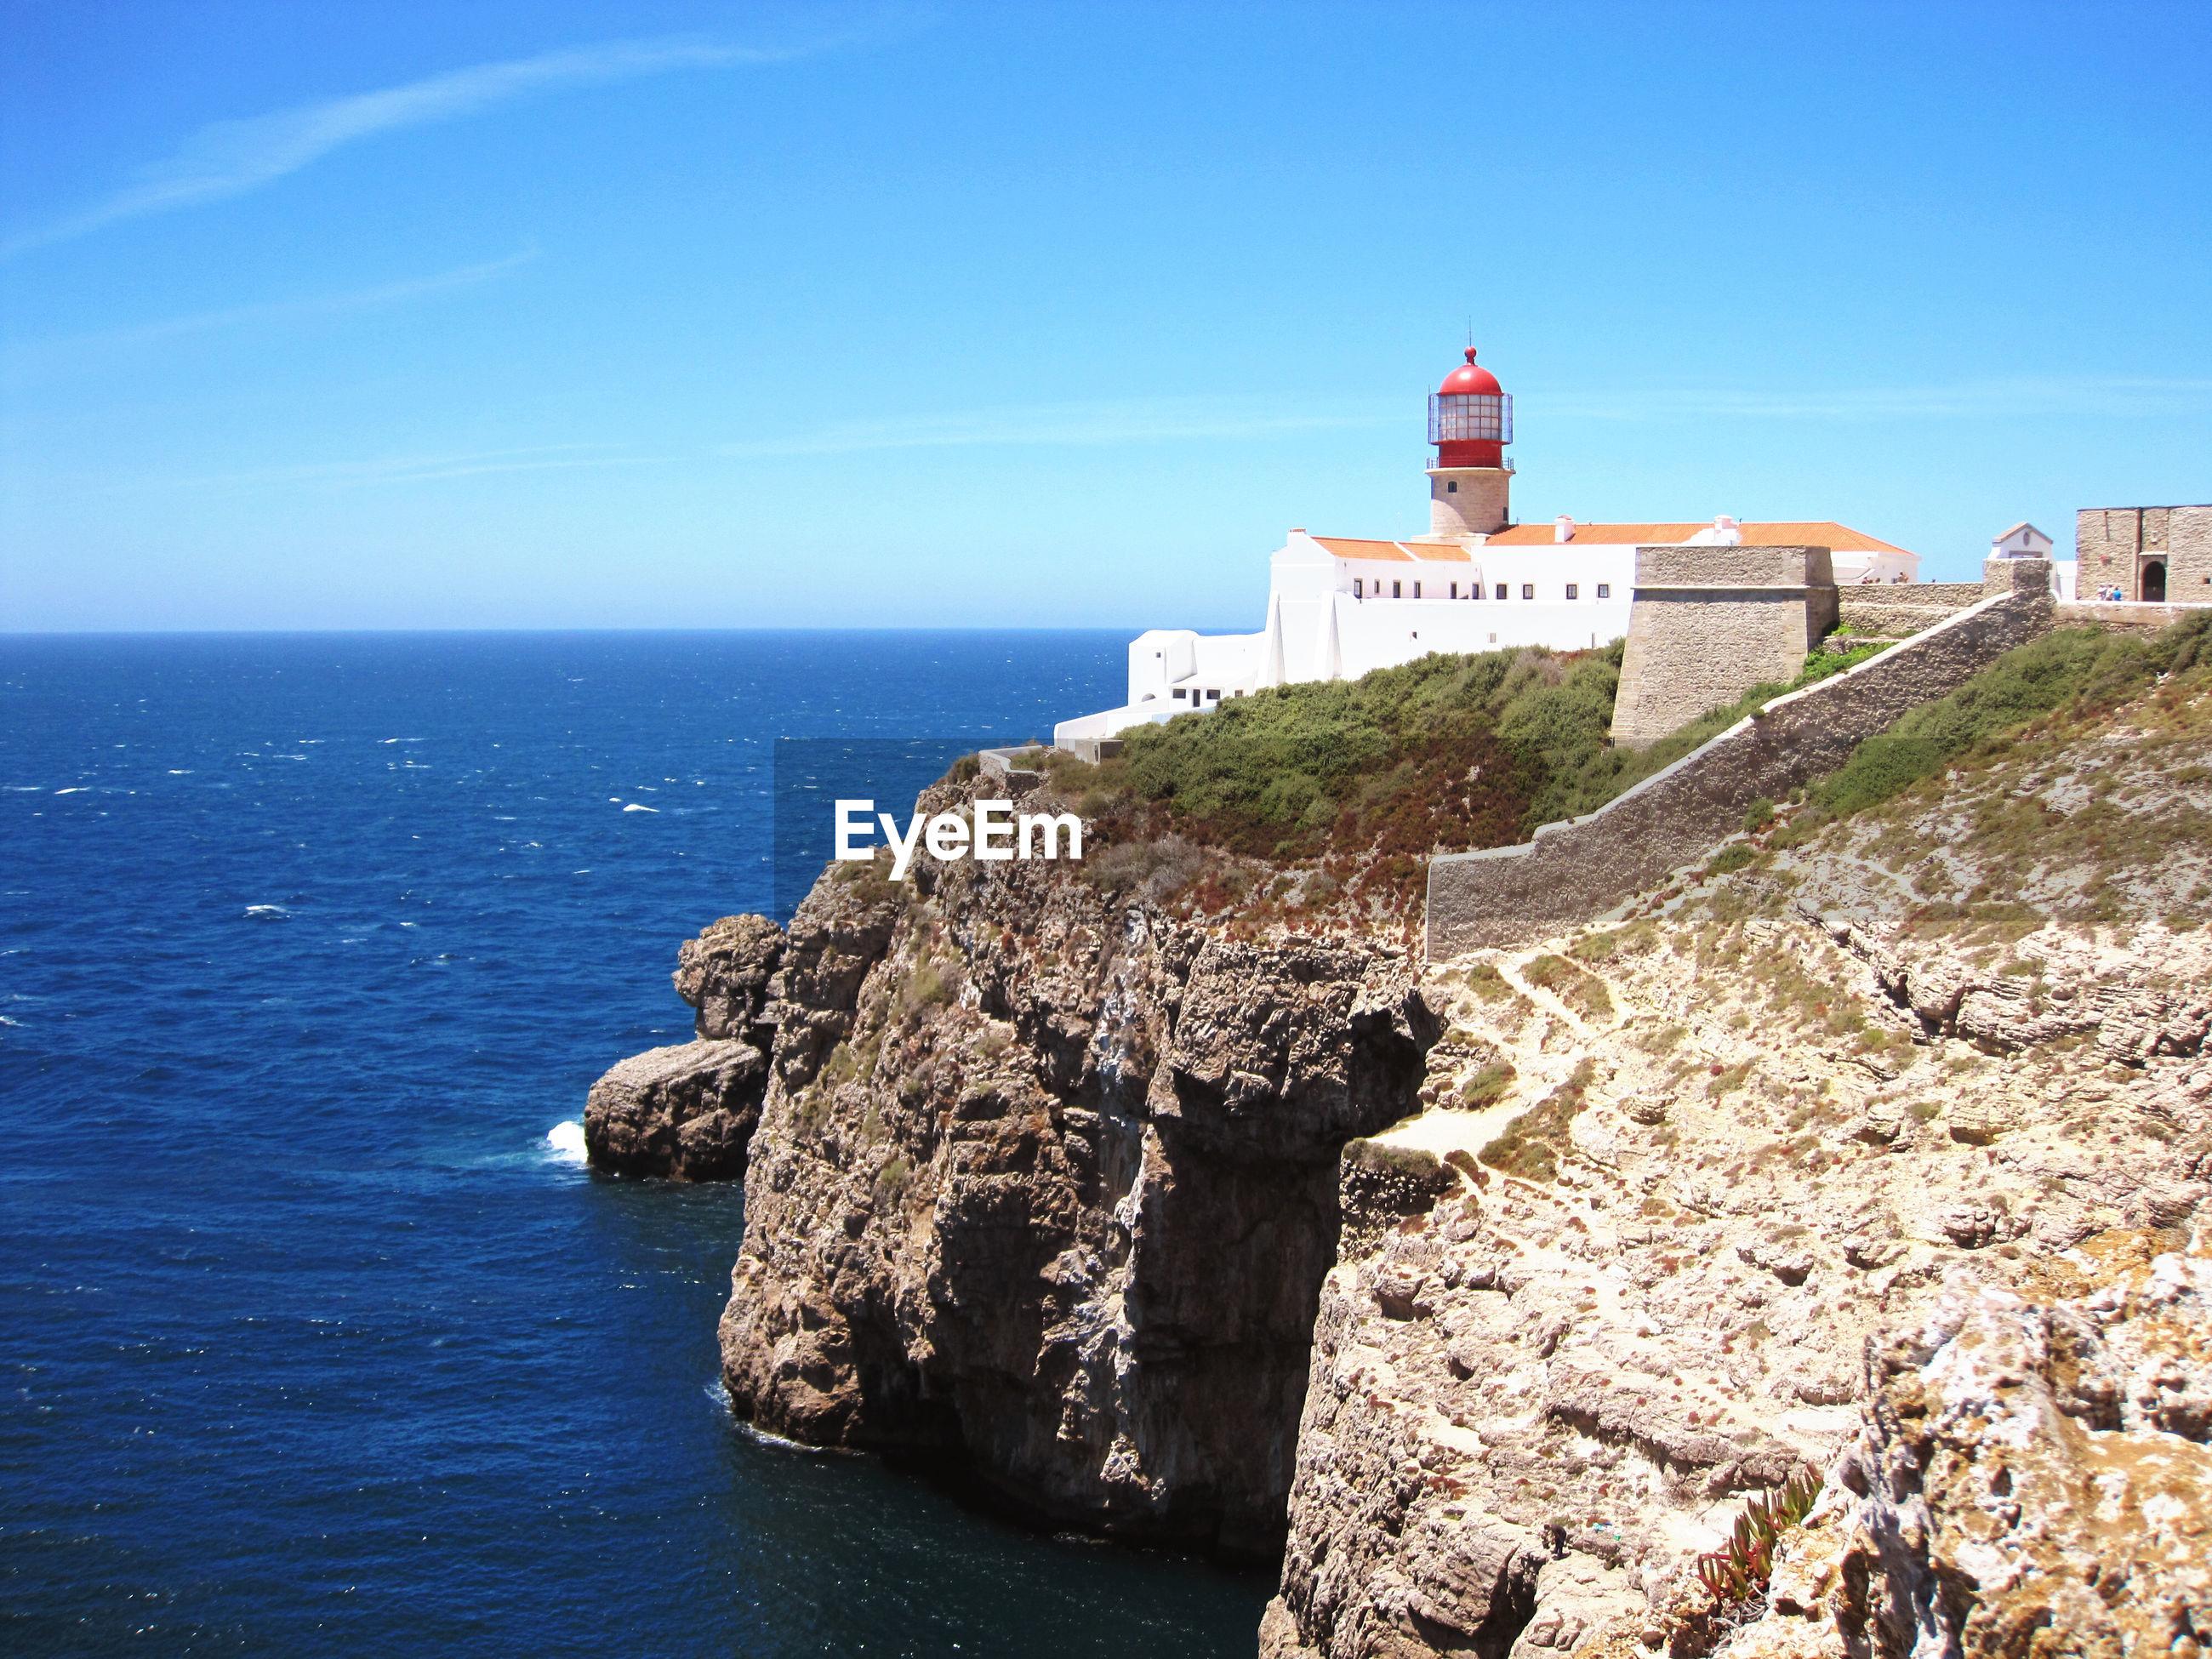 Lighthouse on building by sea against blue sky